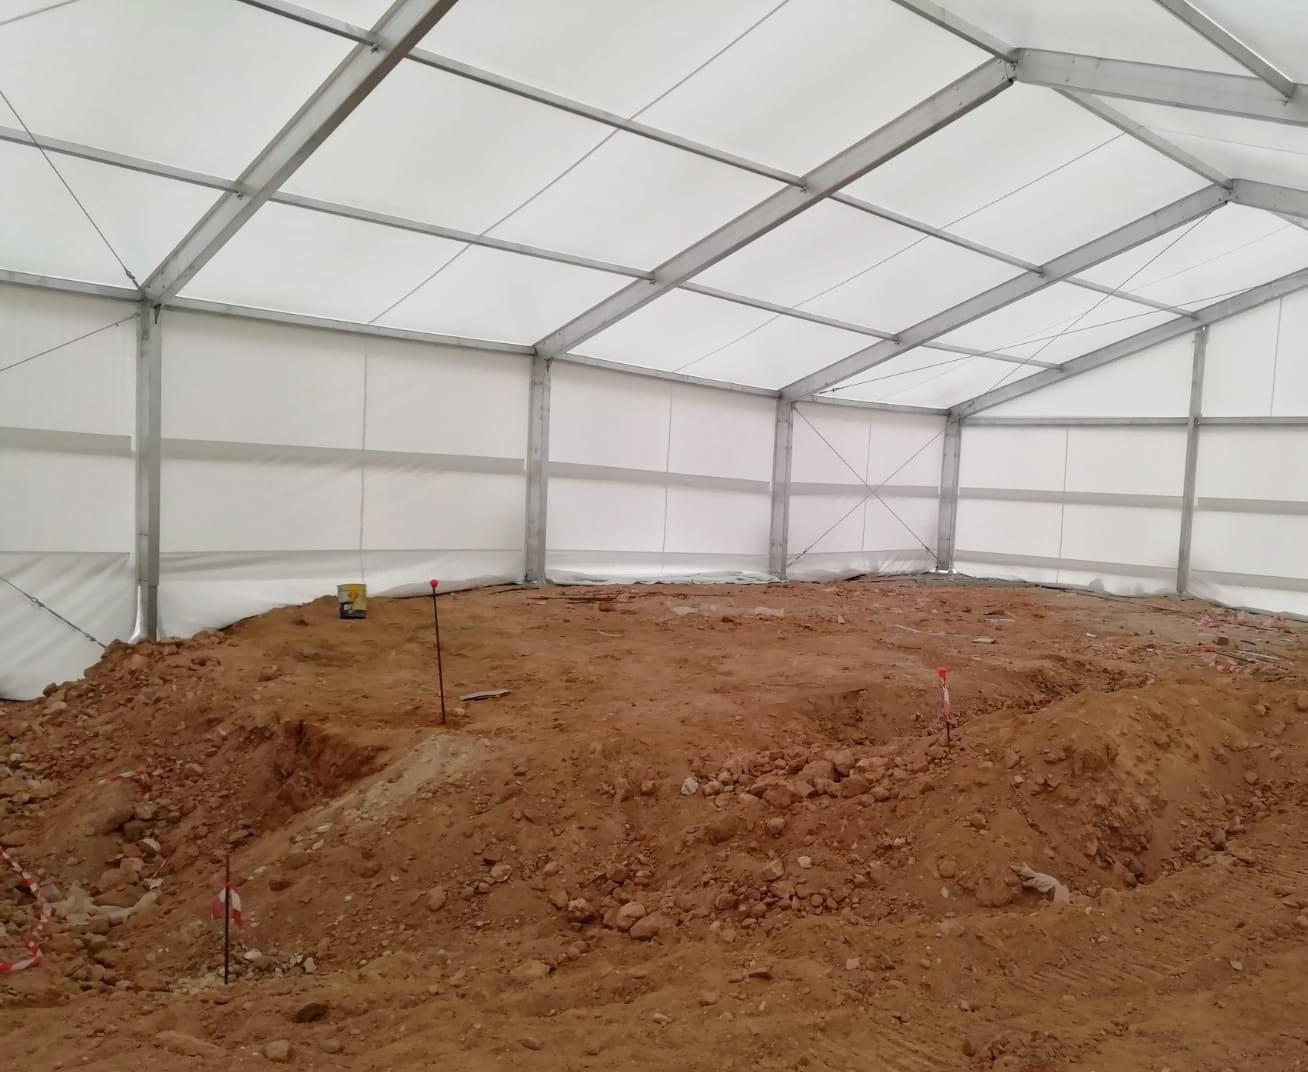 Carpa para yacimientos arqueológicos